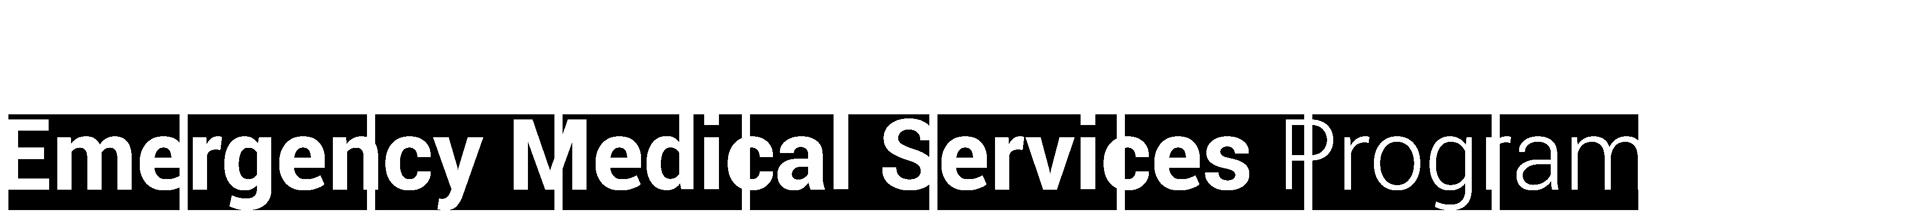 Emergency Medical Services Program